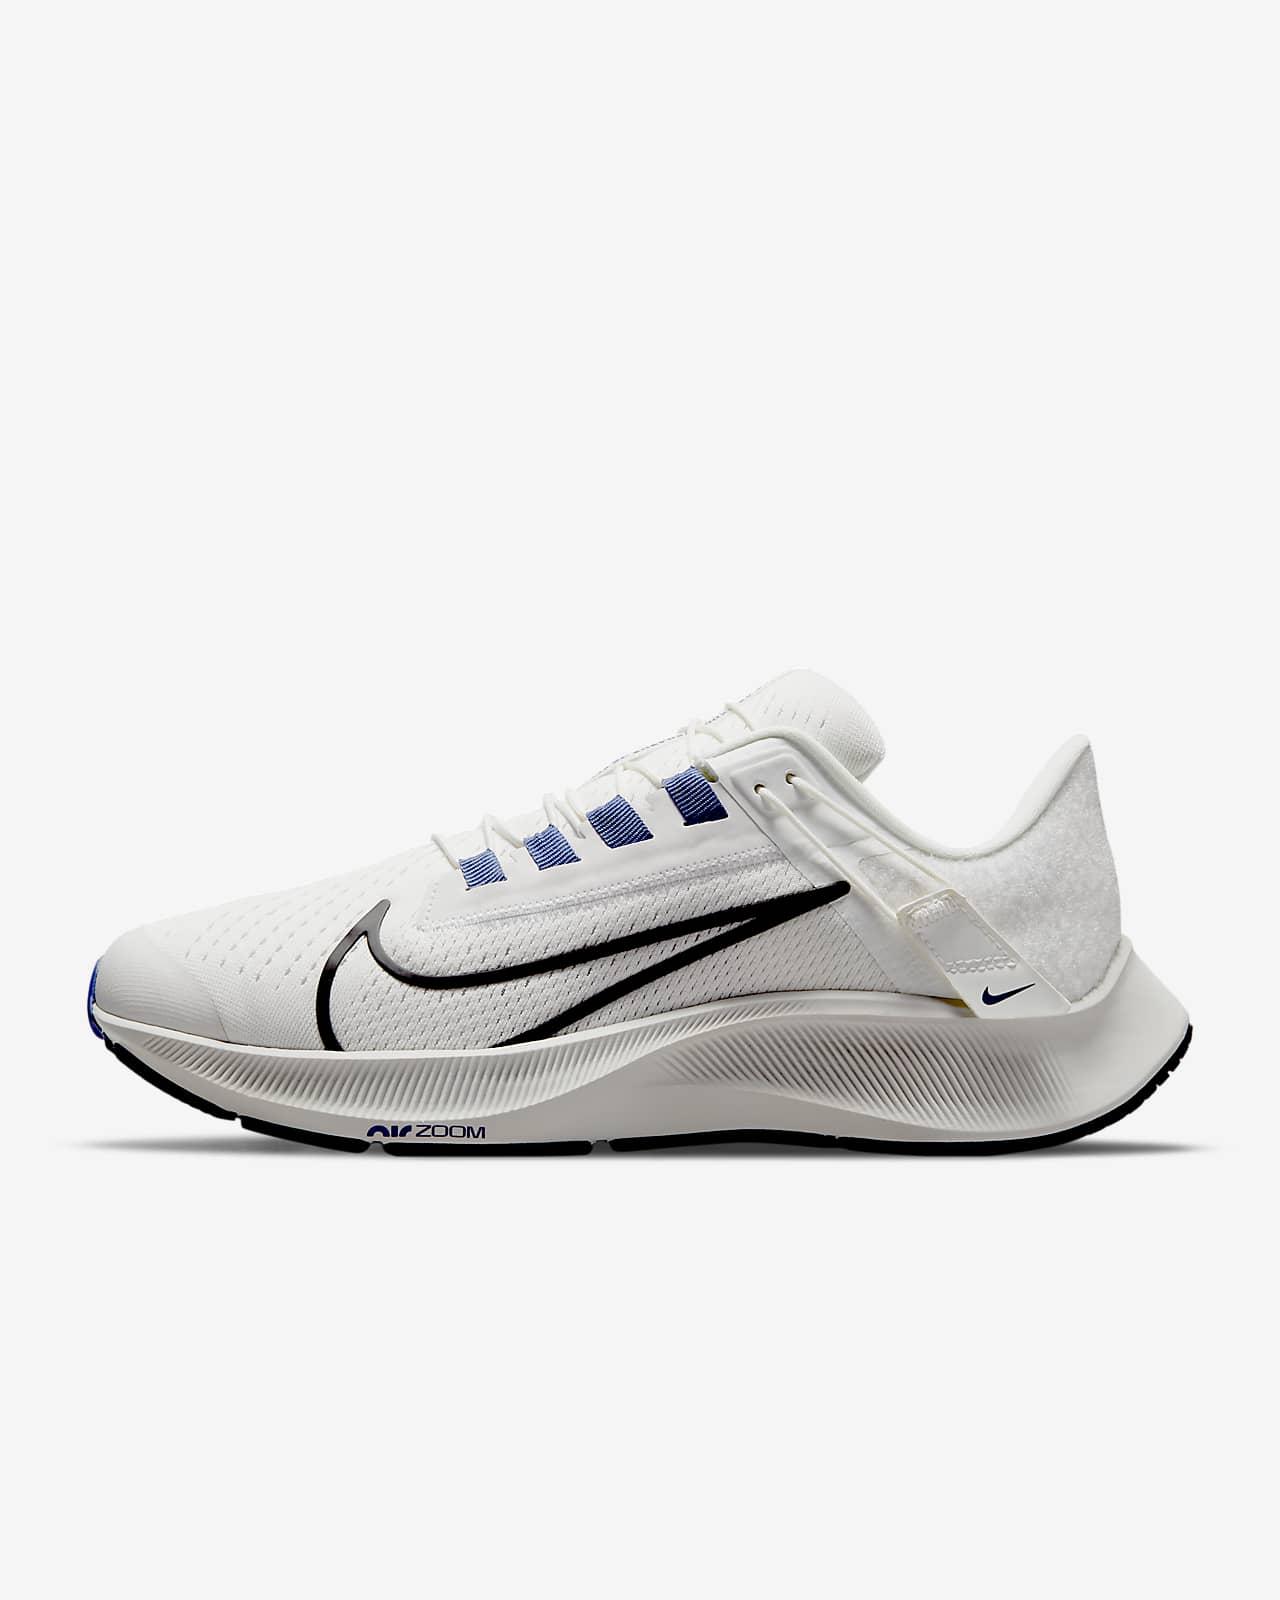 Nike Air Zoom Pegasus 38 FlyEase Women's Running Shoe (Wide)